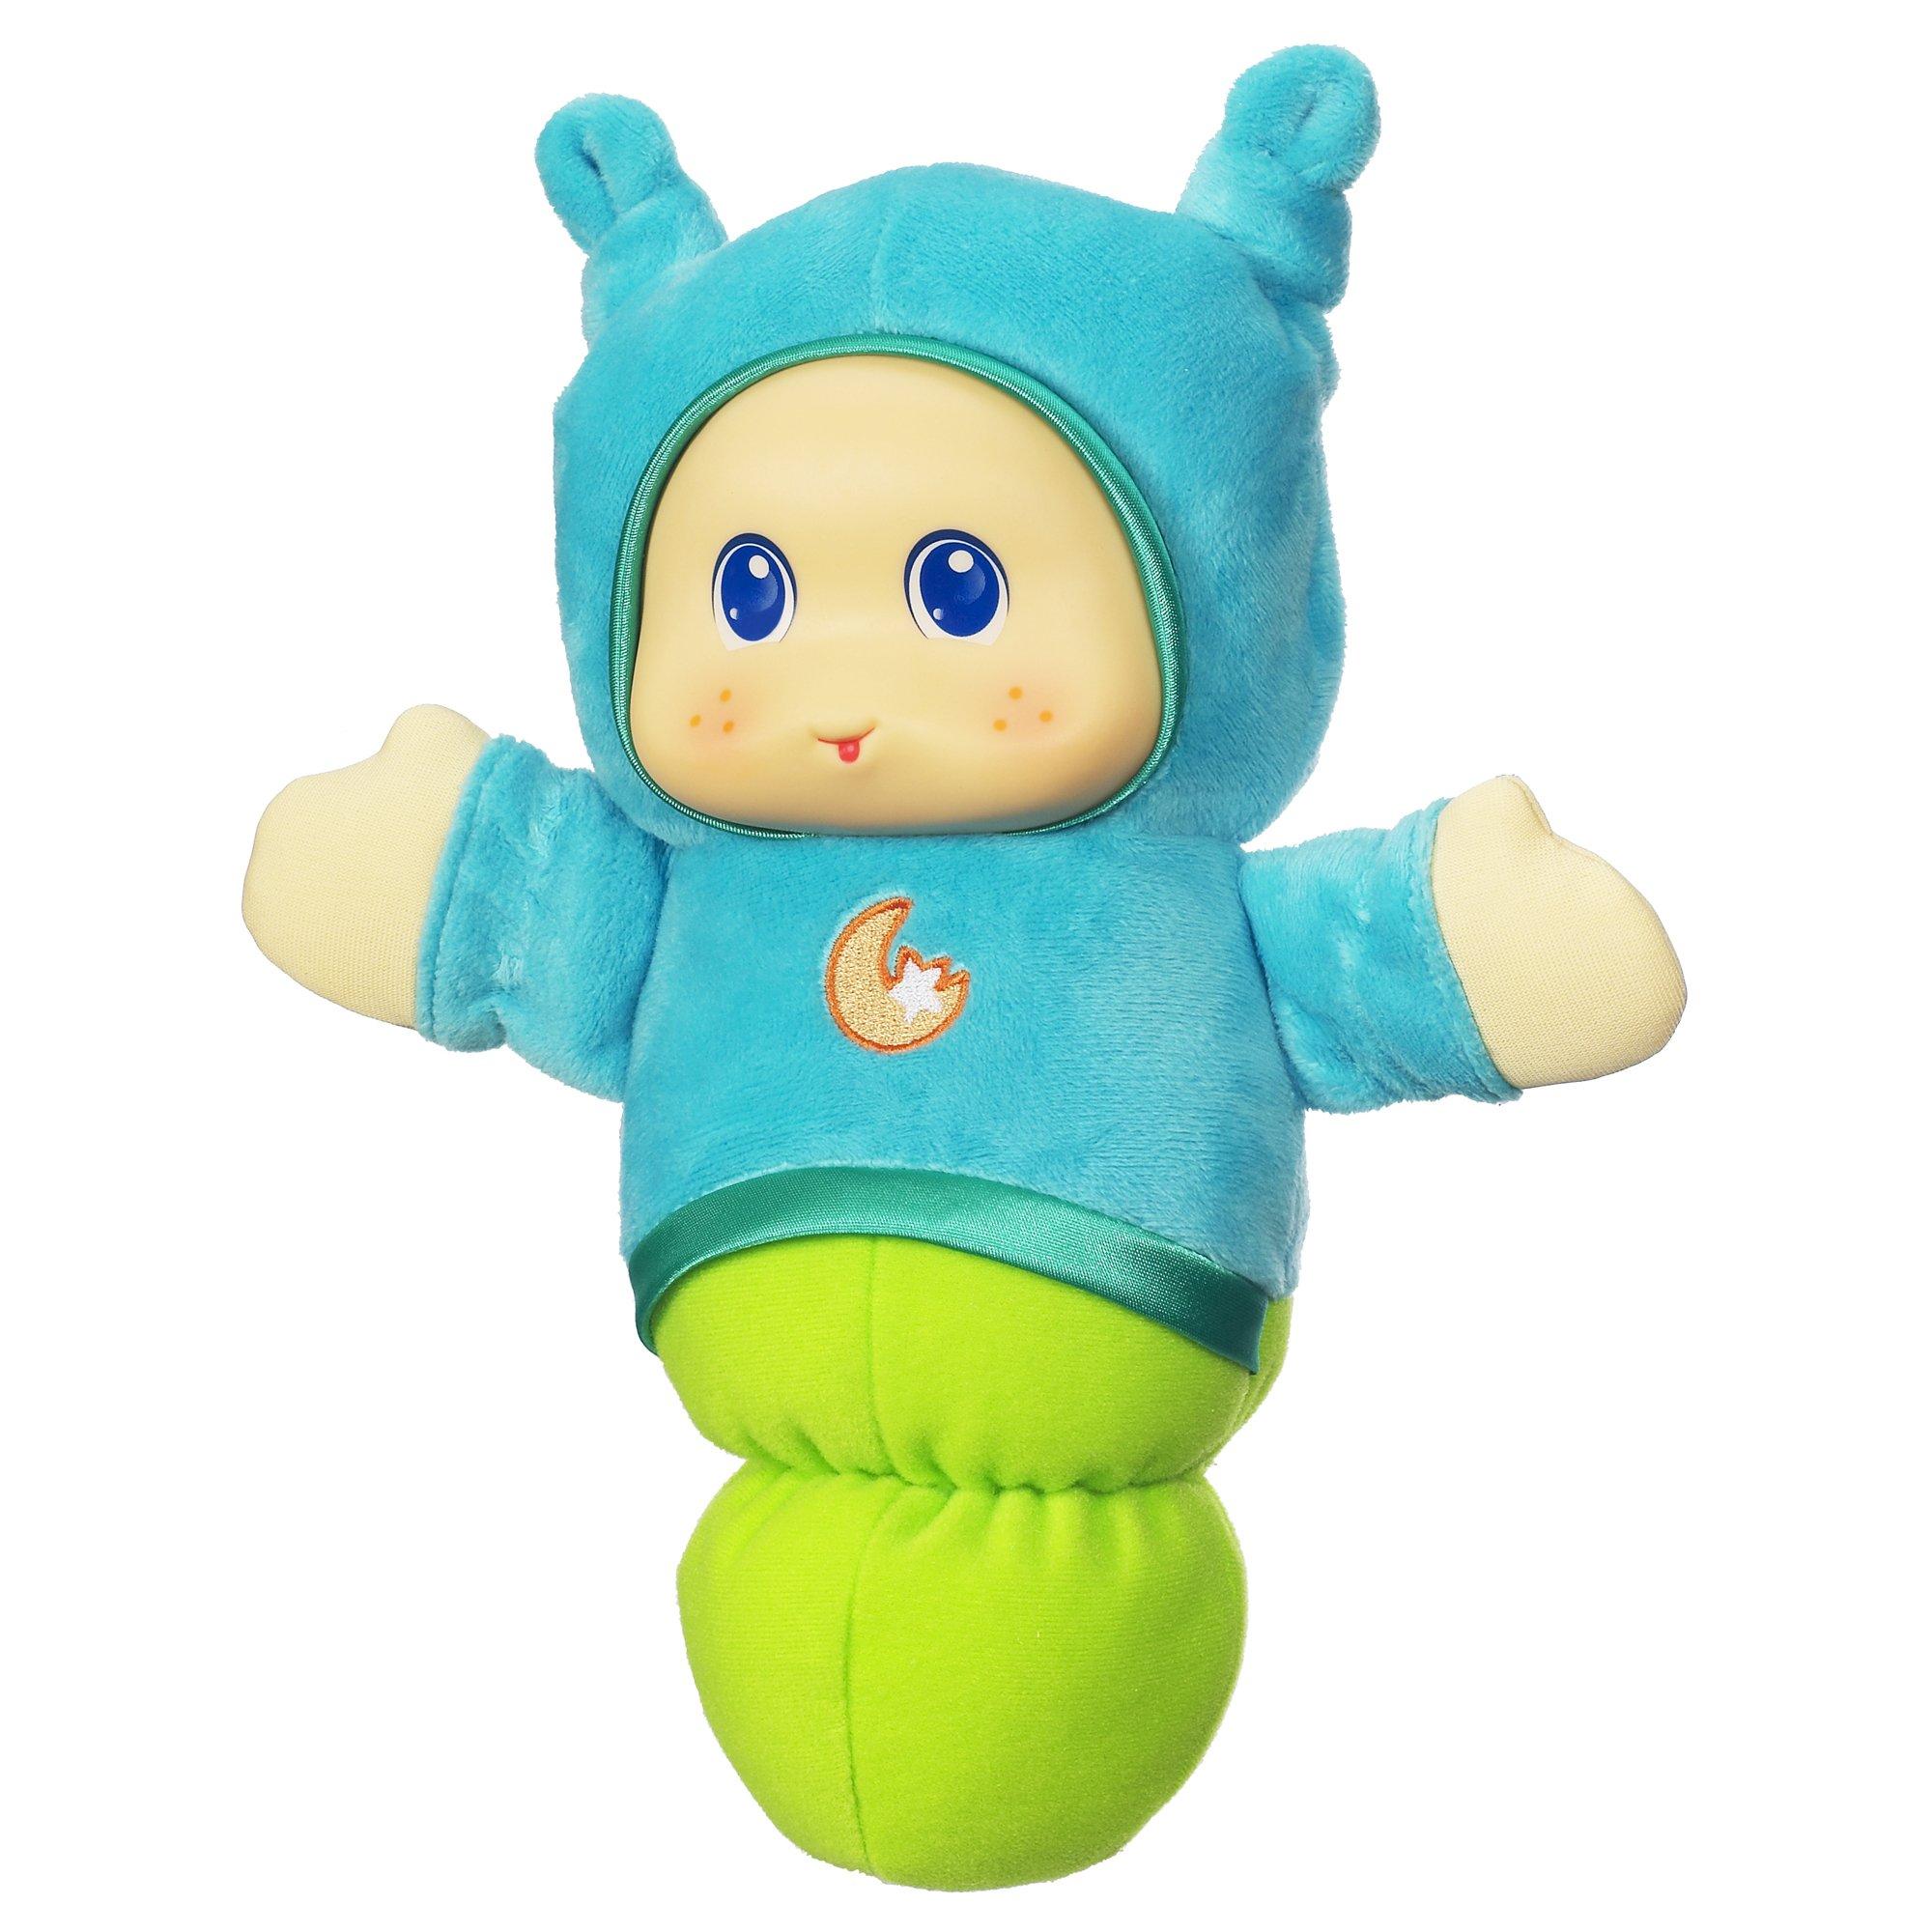 Playskool Lullaby Gloworm Toy, Blue (Amazon Exclusive)